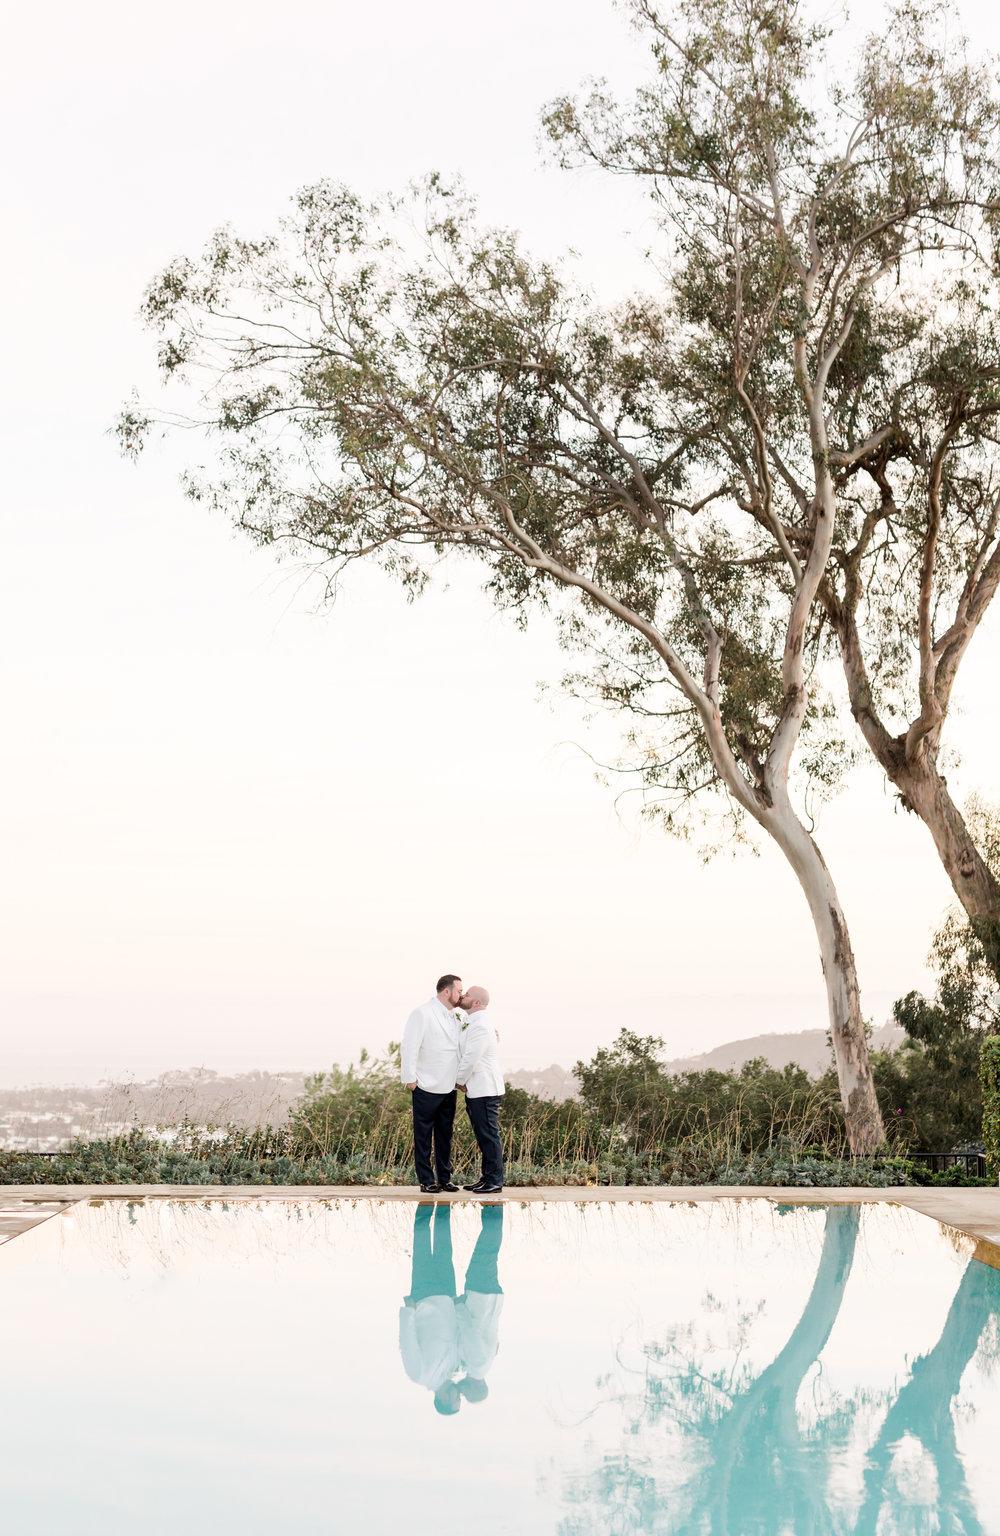 William and Andrew's wedding day at Belmond EL Encanto Santa Barbara, CA Gray and green wedding